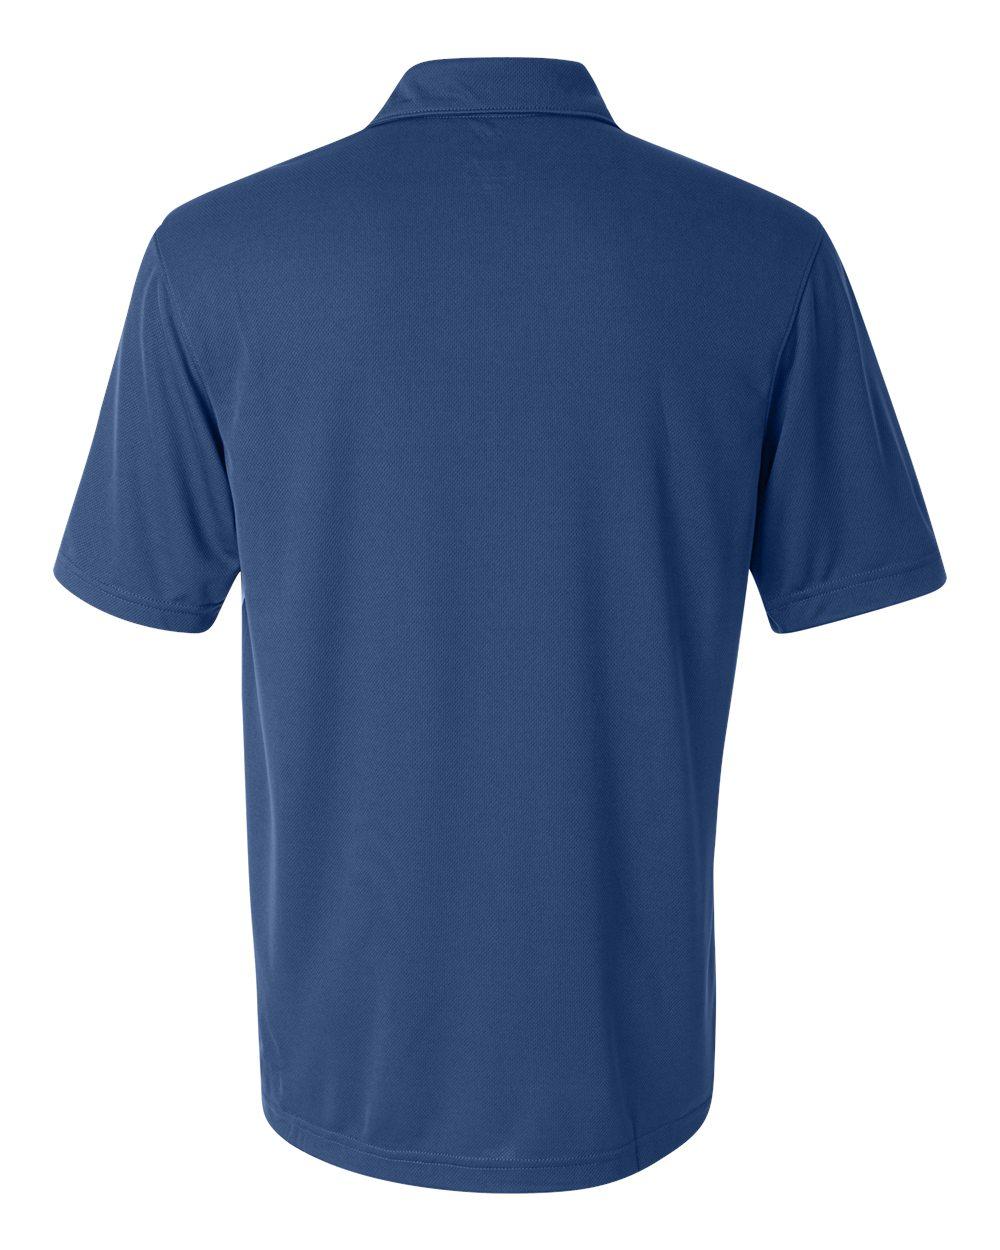 Augusta-Mens-Sportswear-Two-Tone-Premier-Sport-Shirt-5012-up-to-3XL miniature 16